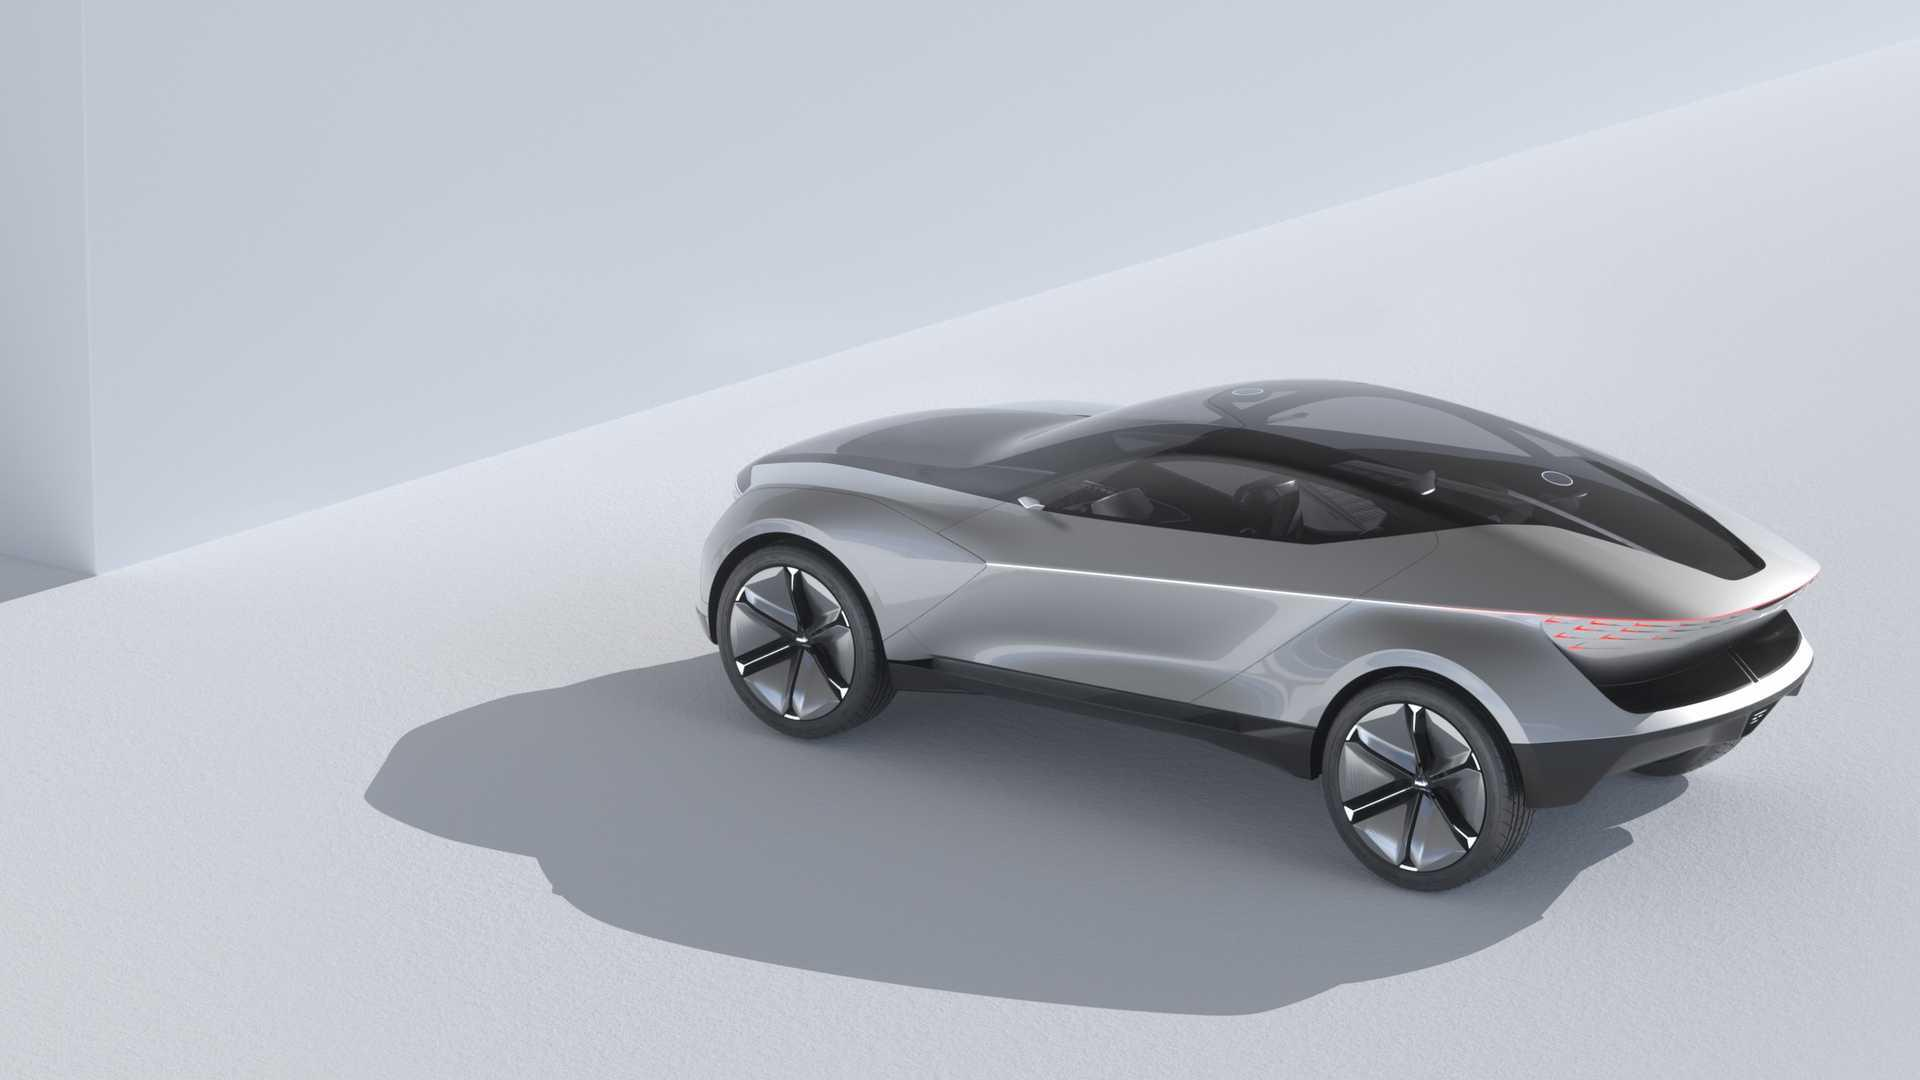 2019-kia-futuron-concept-3